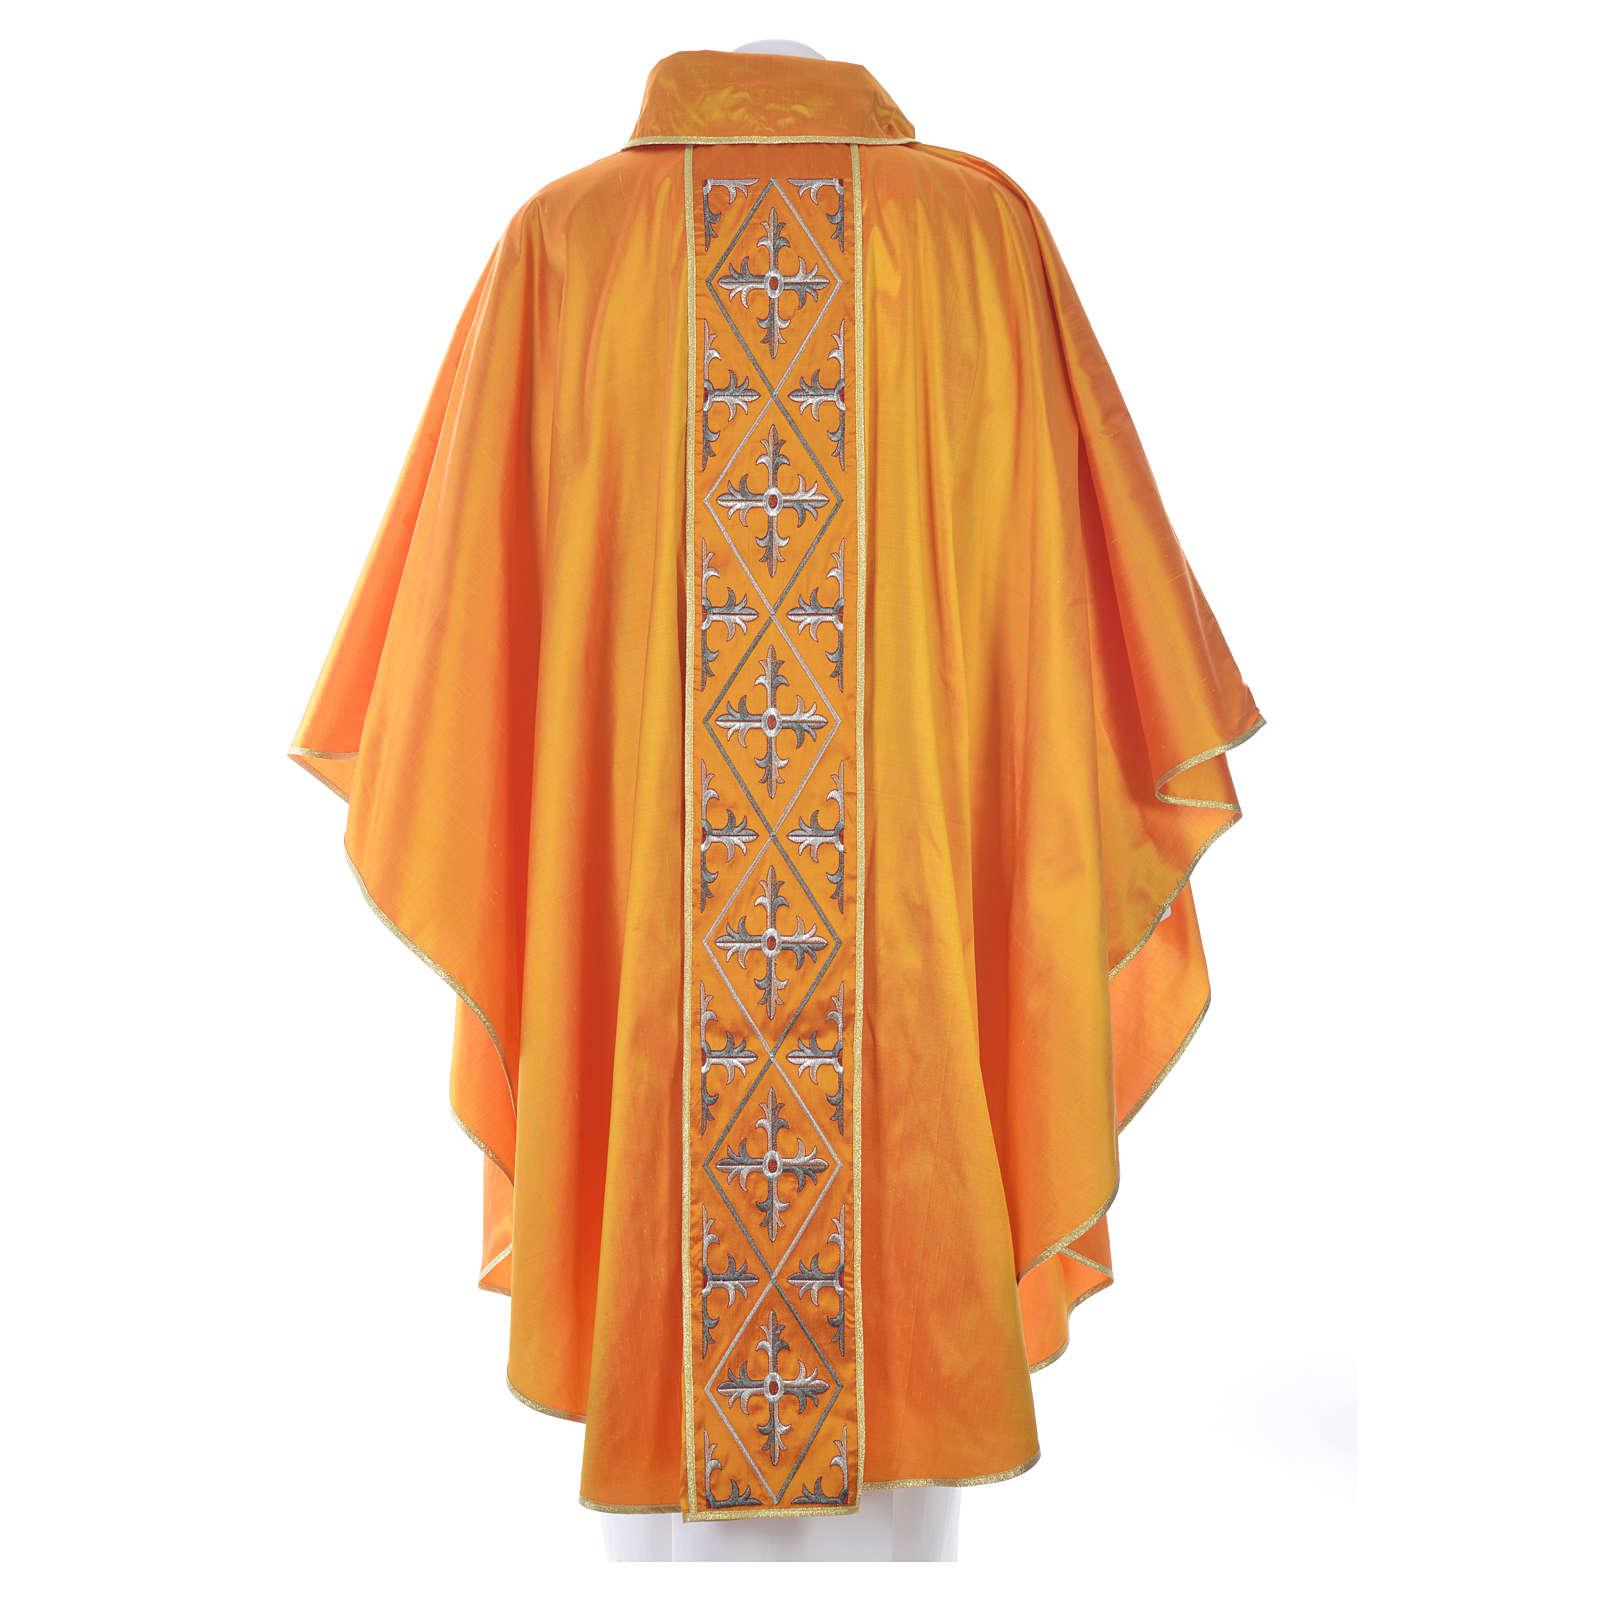 Casula sacerdotale seta 100% ricamo croce 4